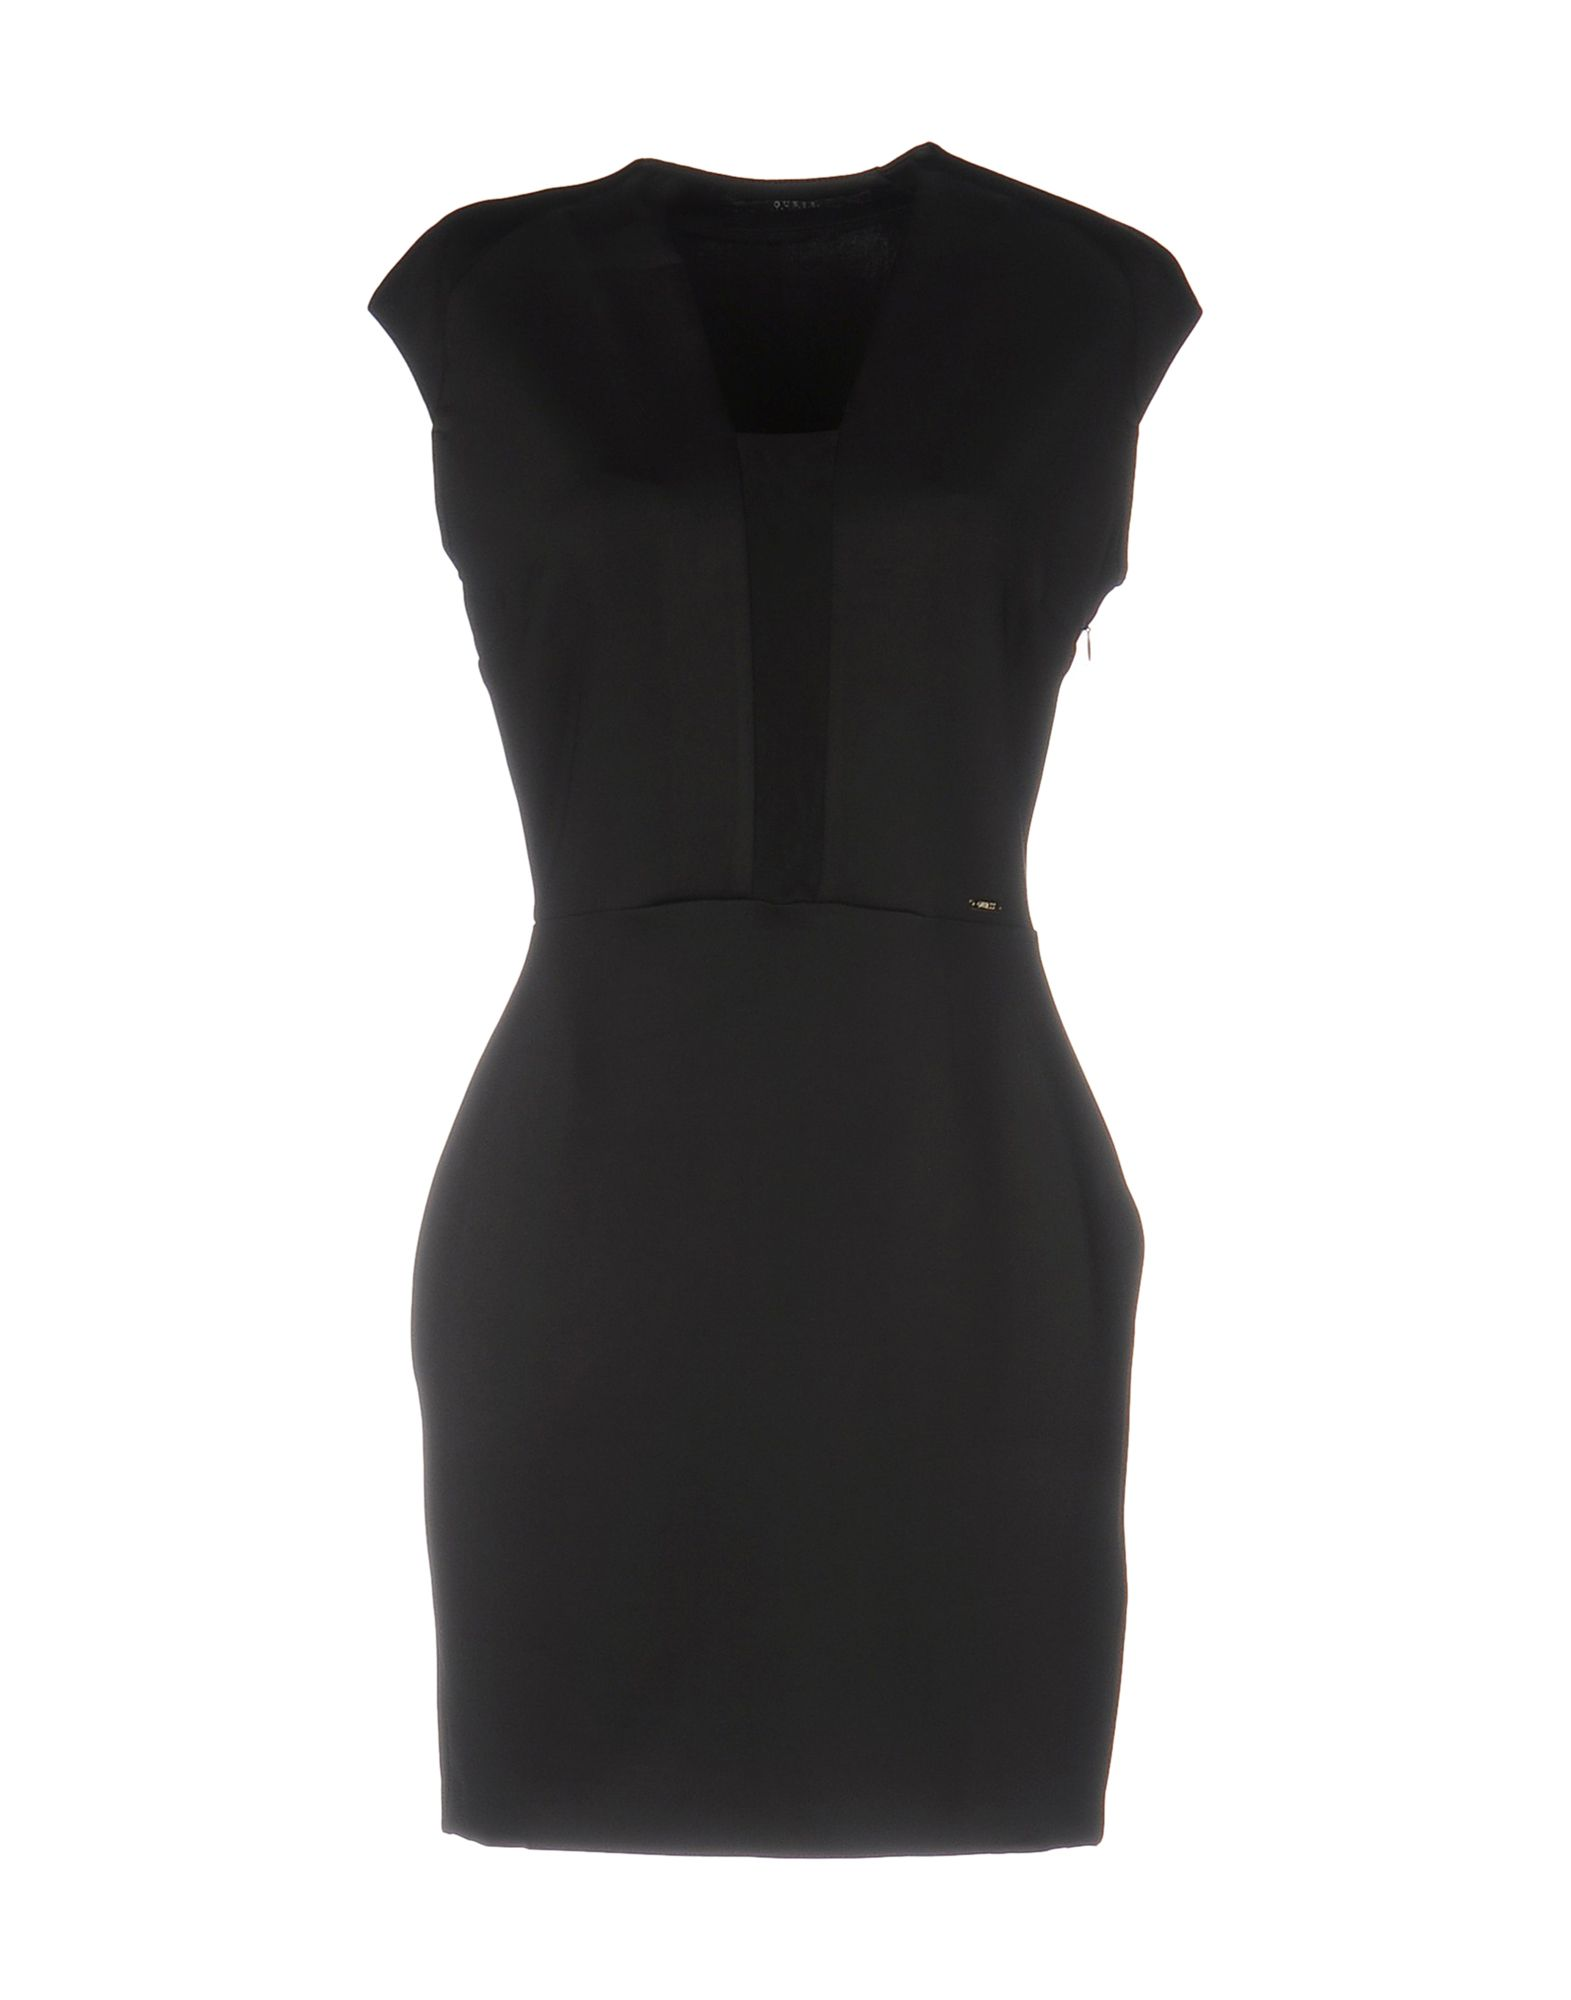 e288eea5bd45 GUESS ΦΟΡΕΜΑΤΑ Κοντό φόρεμα. Φορέματα